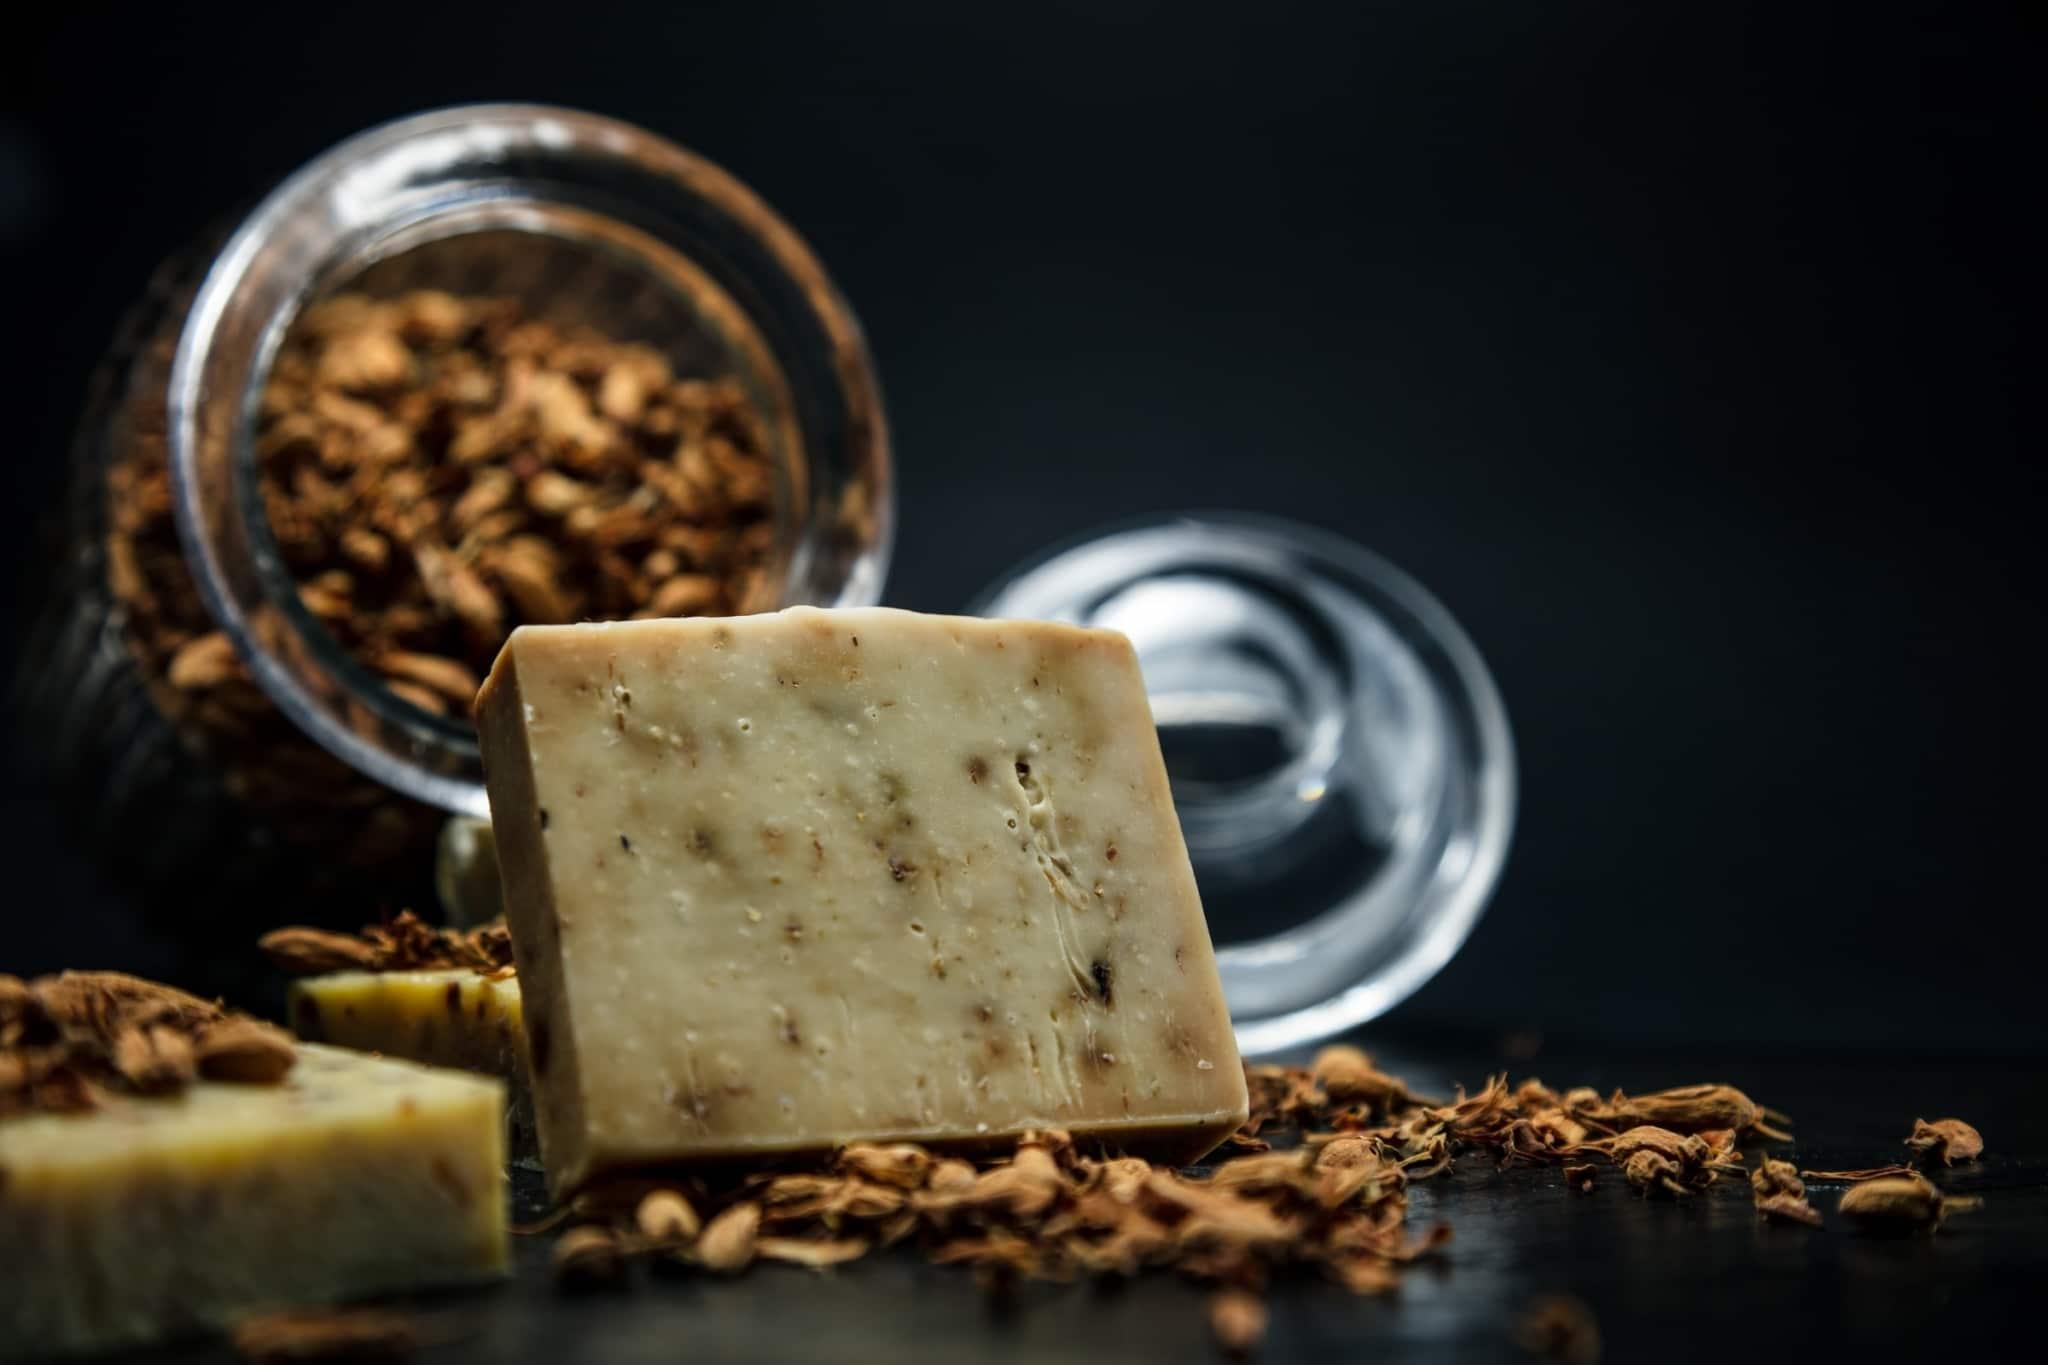 Homemade soap bar